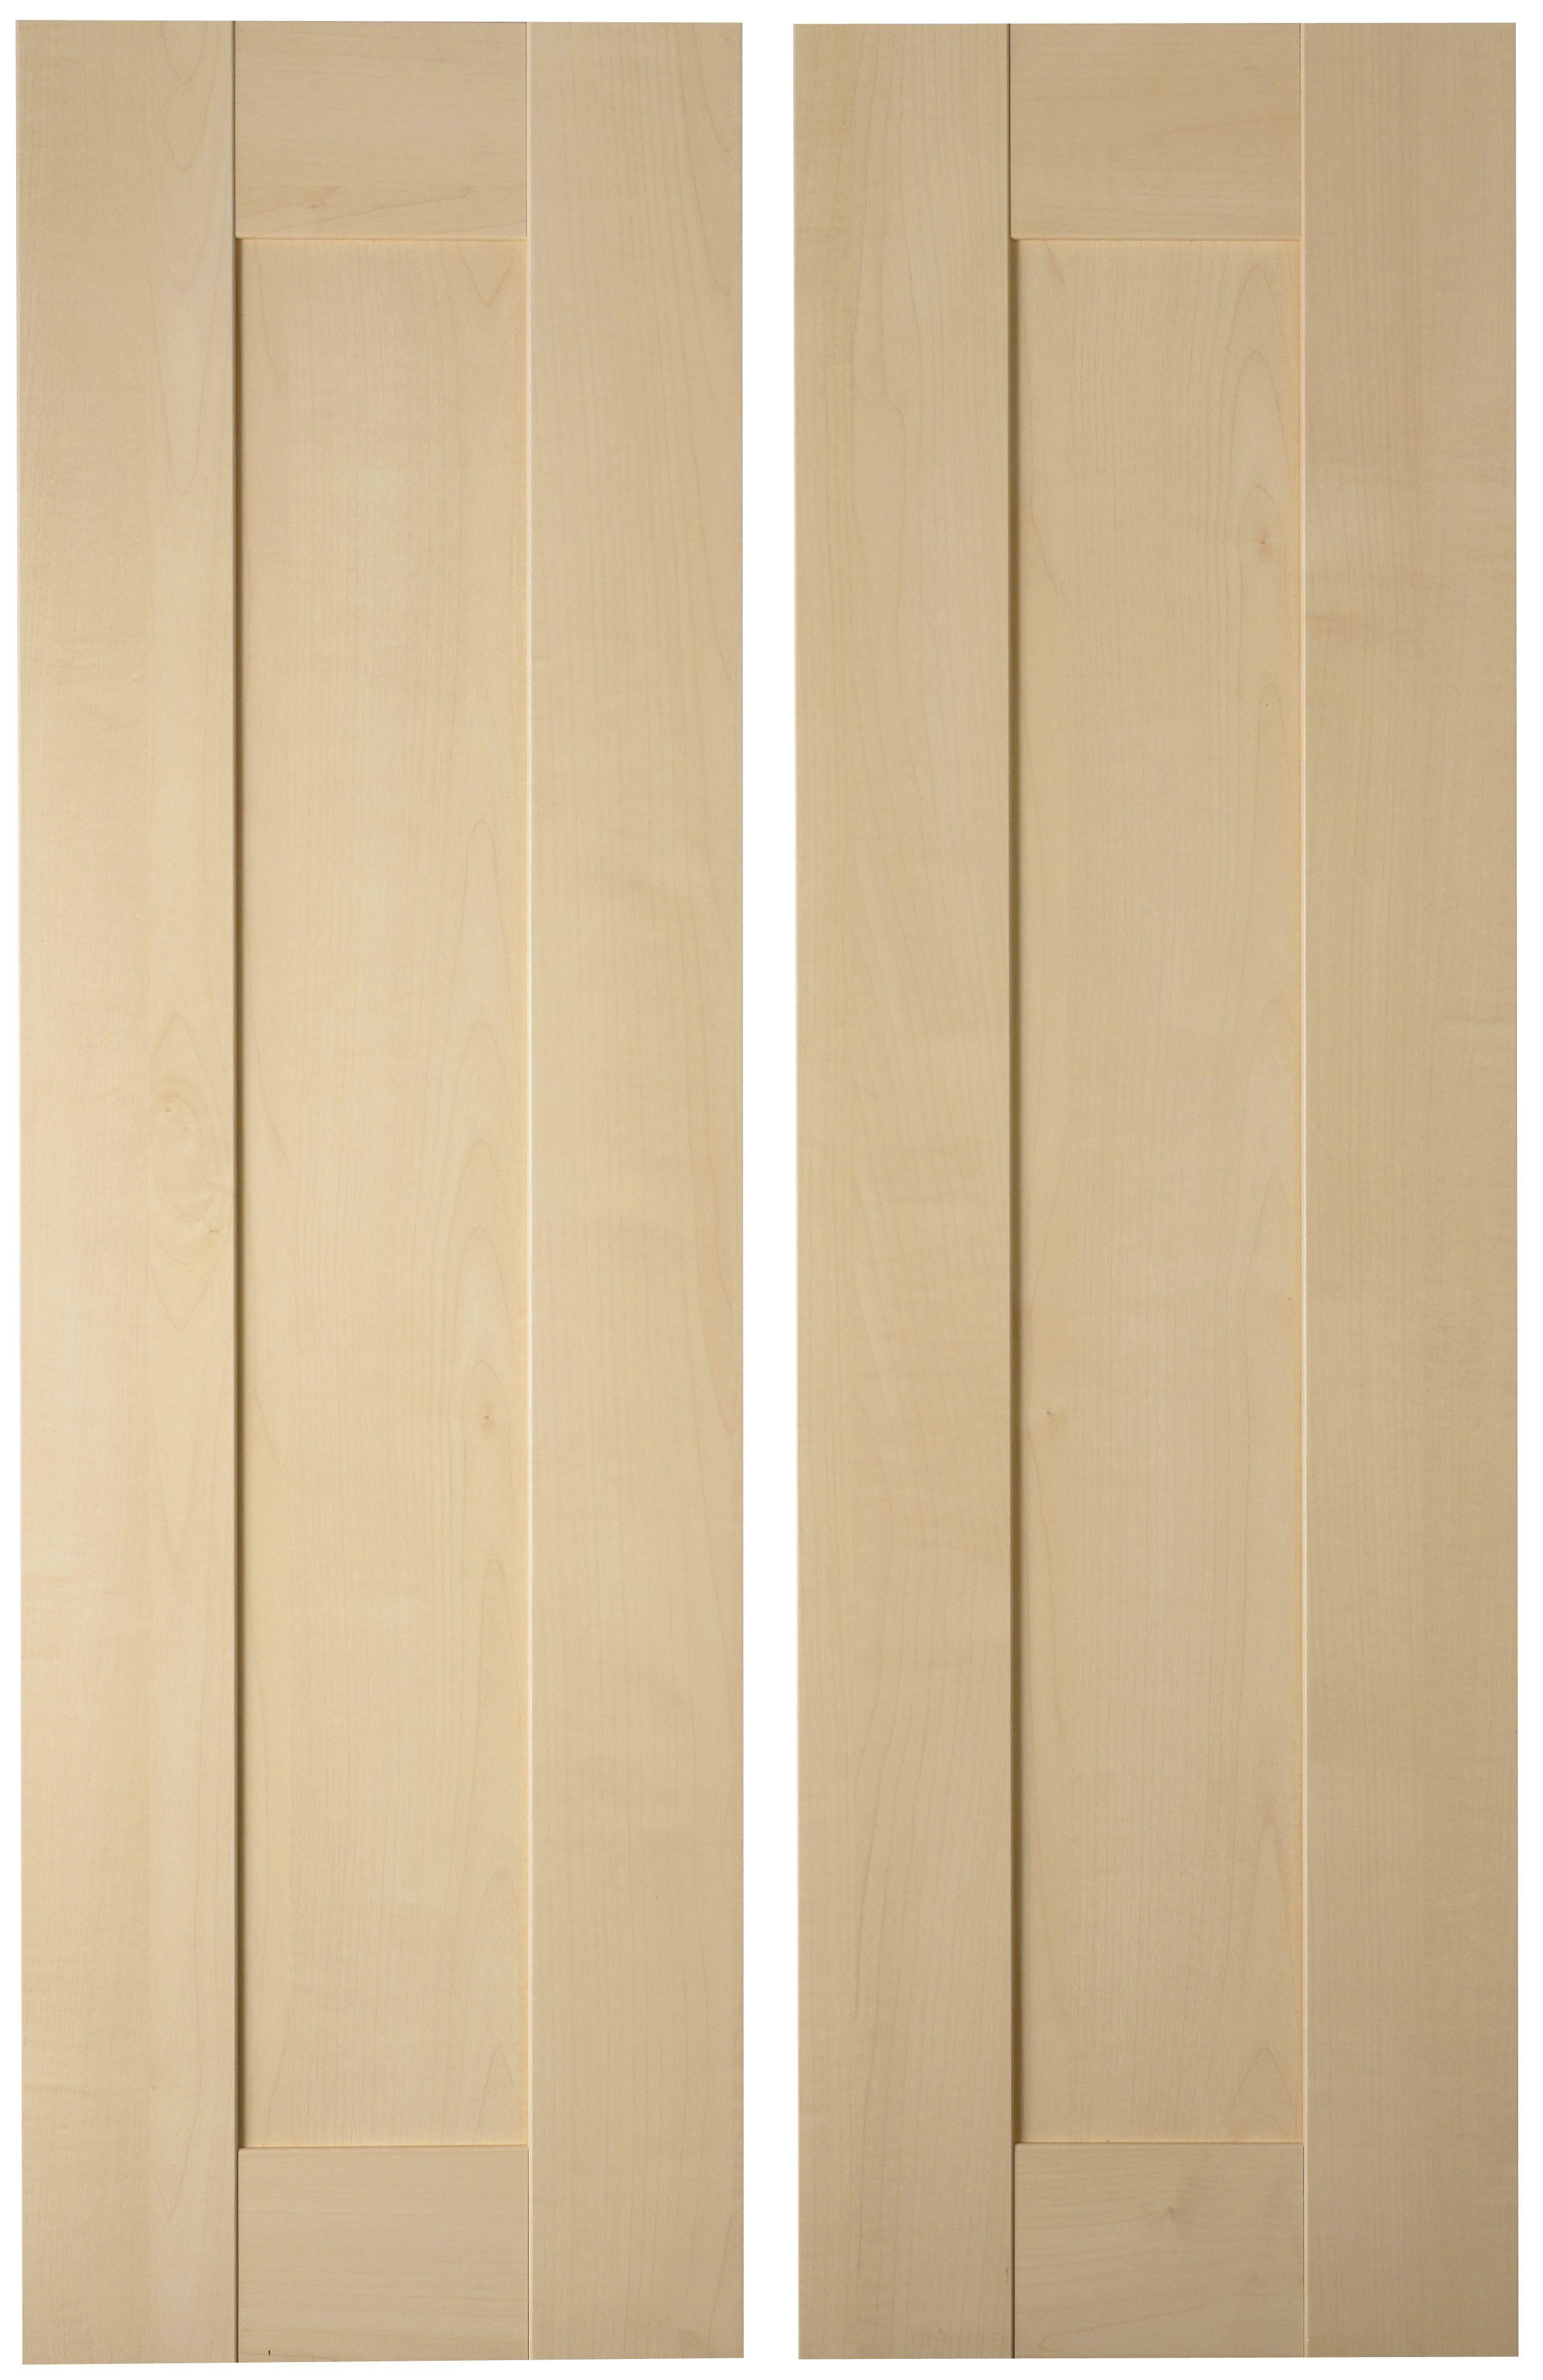 It Kitchens Westleigh Contemporary Maple Effect Shaker Larder Door (w)300mm, Set Of 2